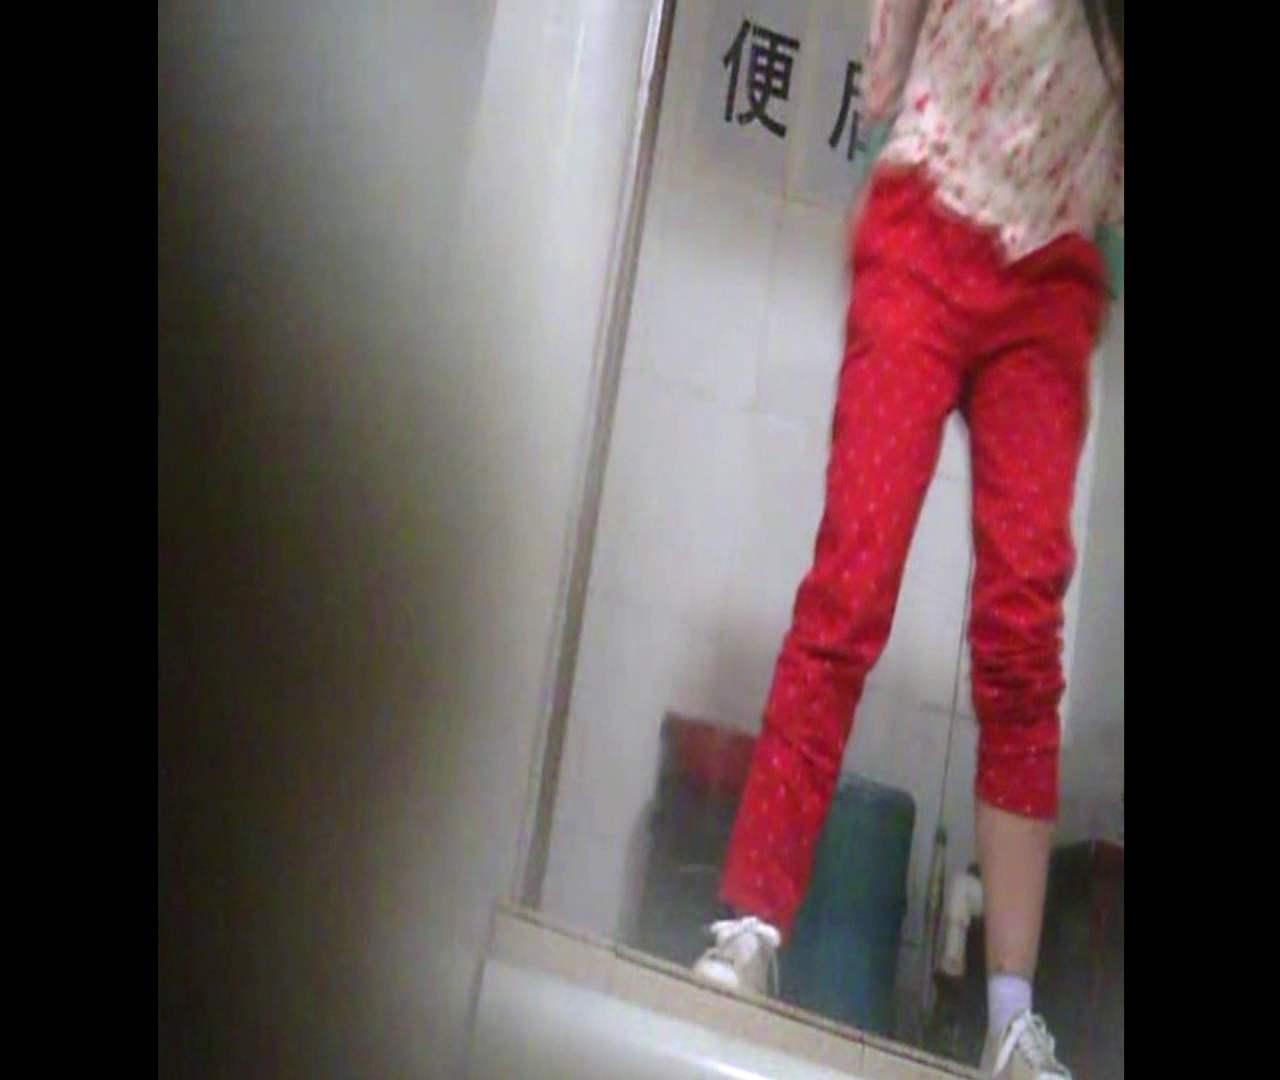 Vol.01 赤のパンツスタイルがとっても眩しい!! 洗面所 | 丸見え  61画像 4